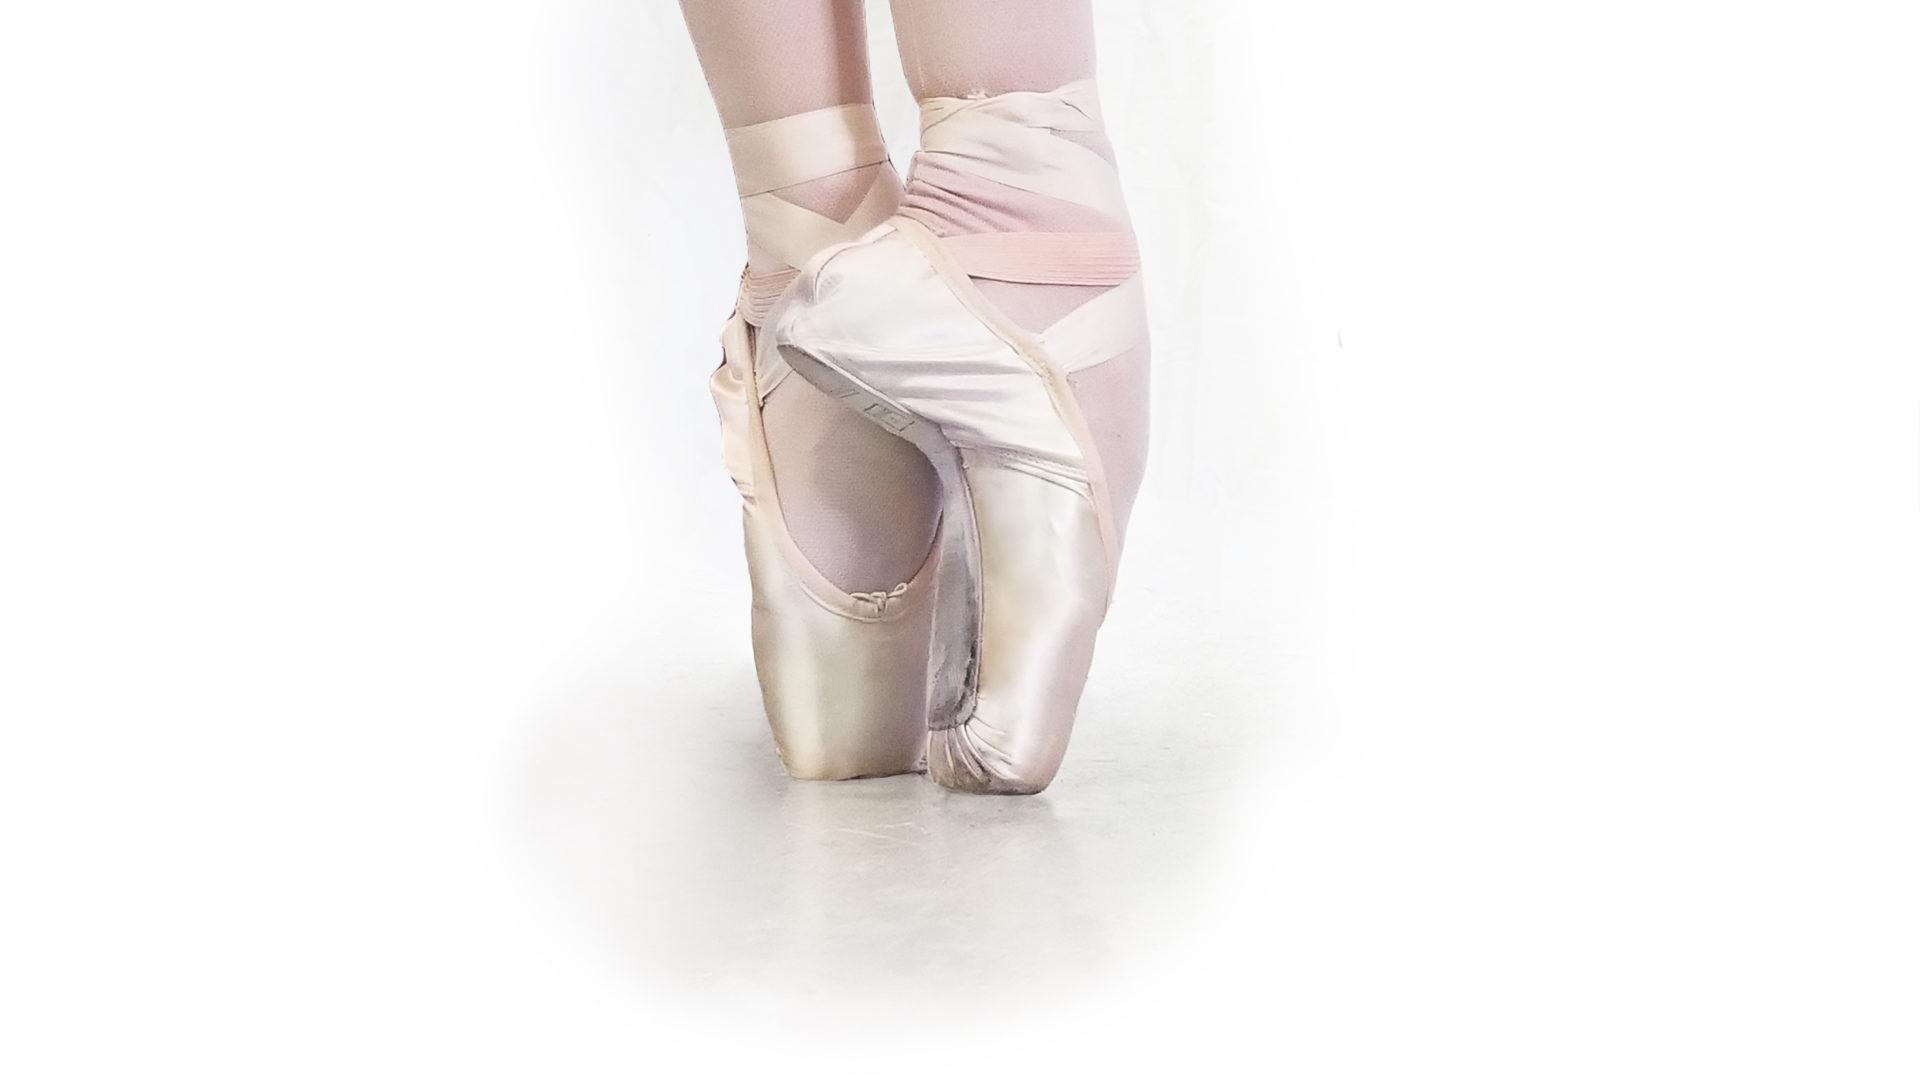 Louisville Academy of Dance